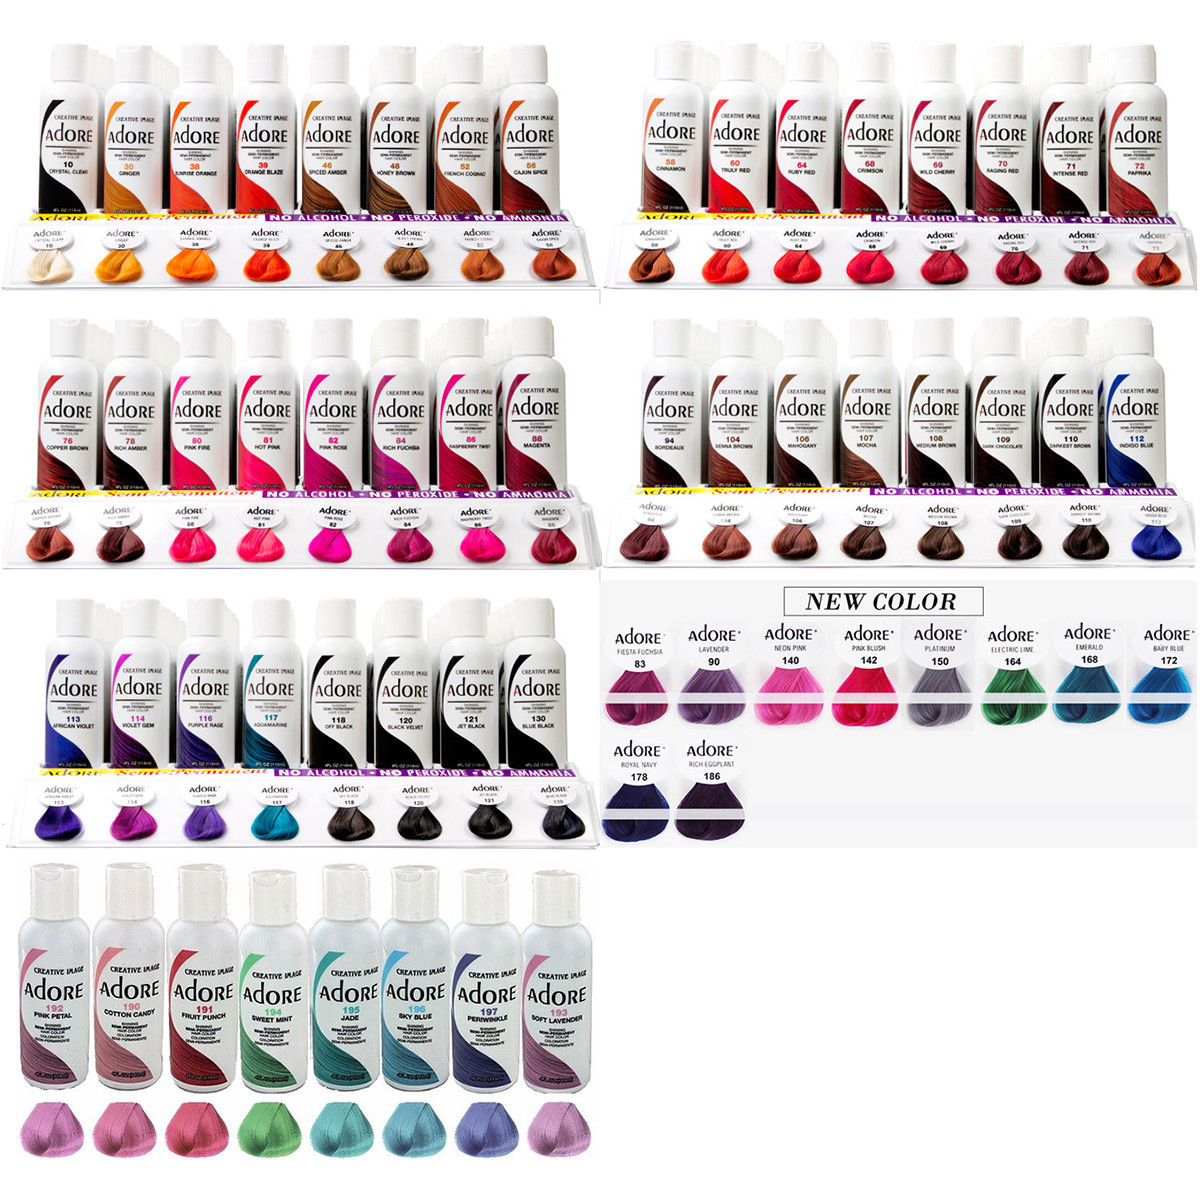 Park Art My WordPress Blog_Adore Semi Permanent Hair Color Chart